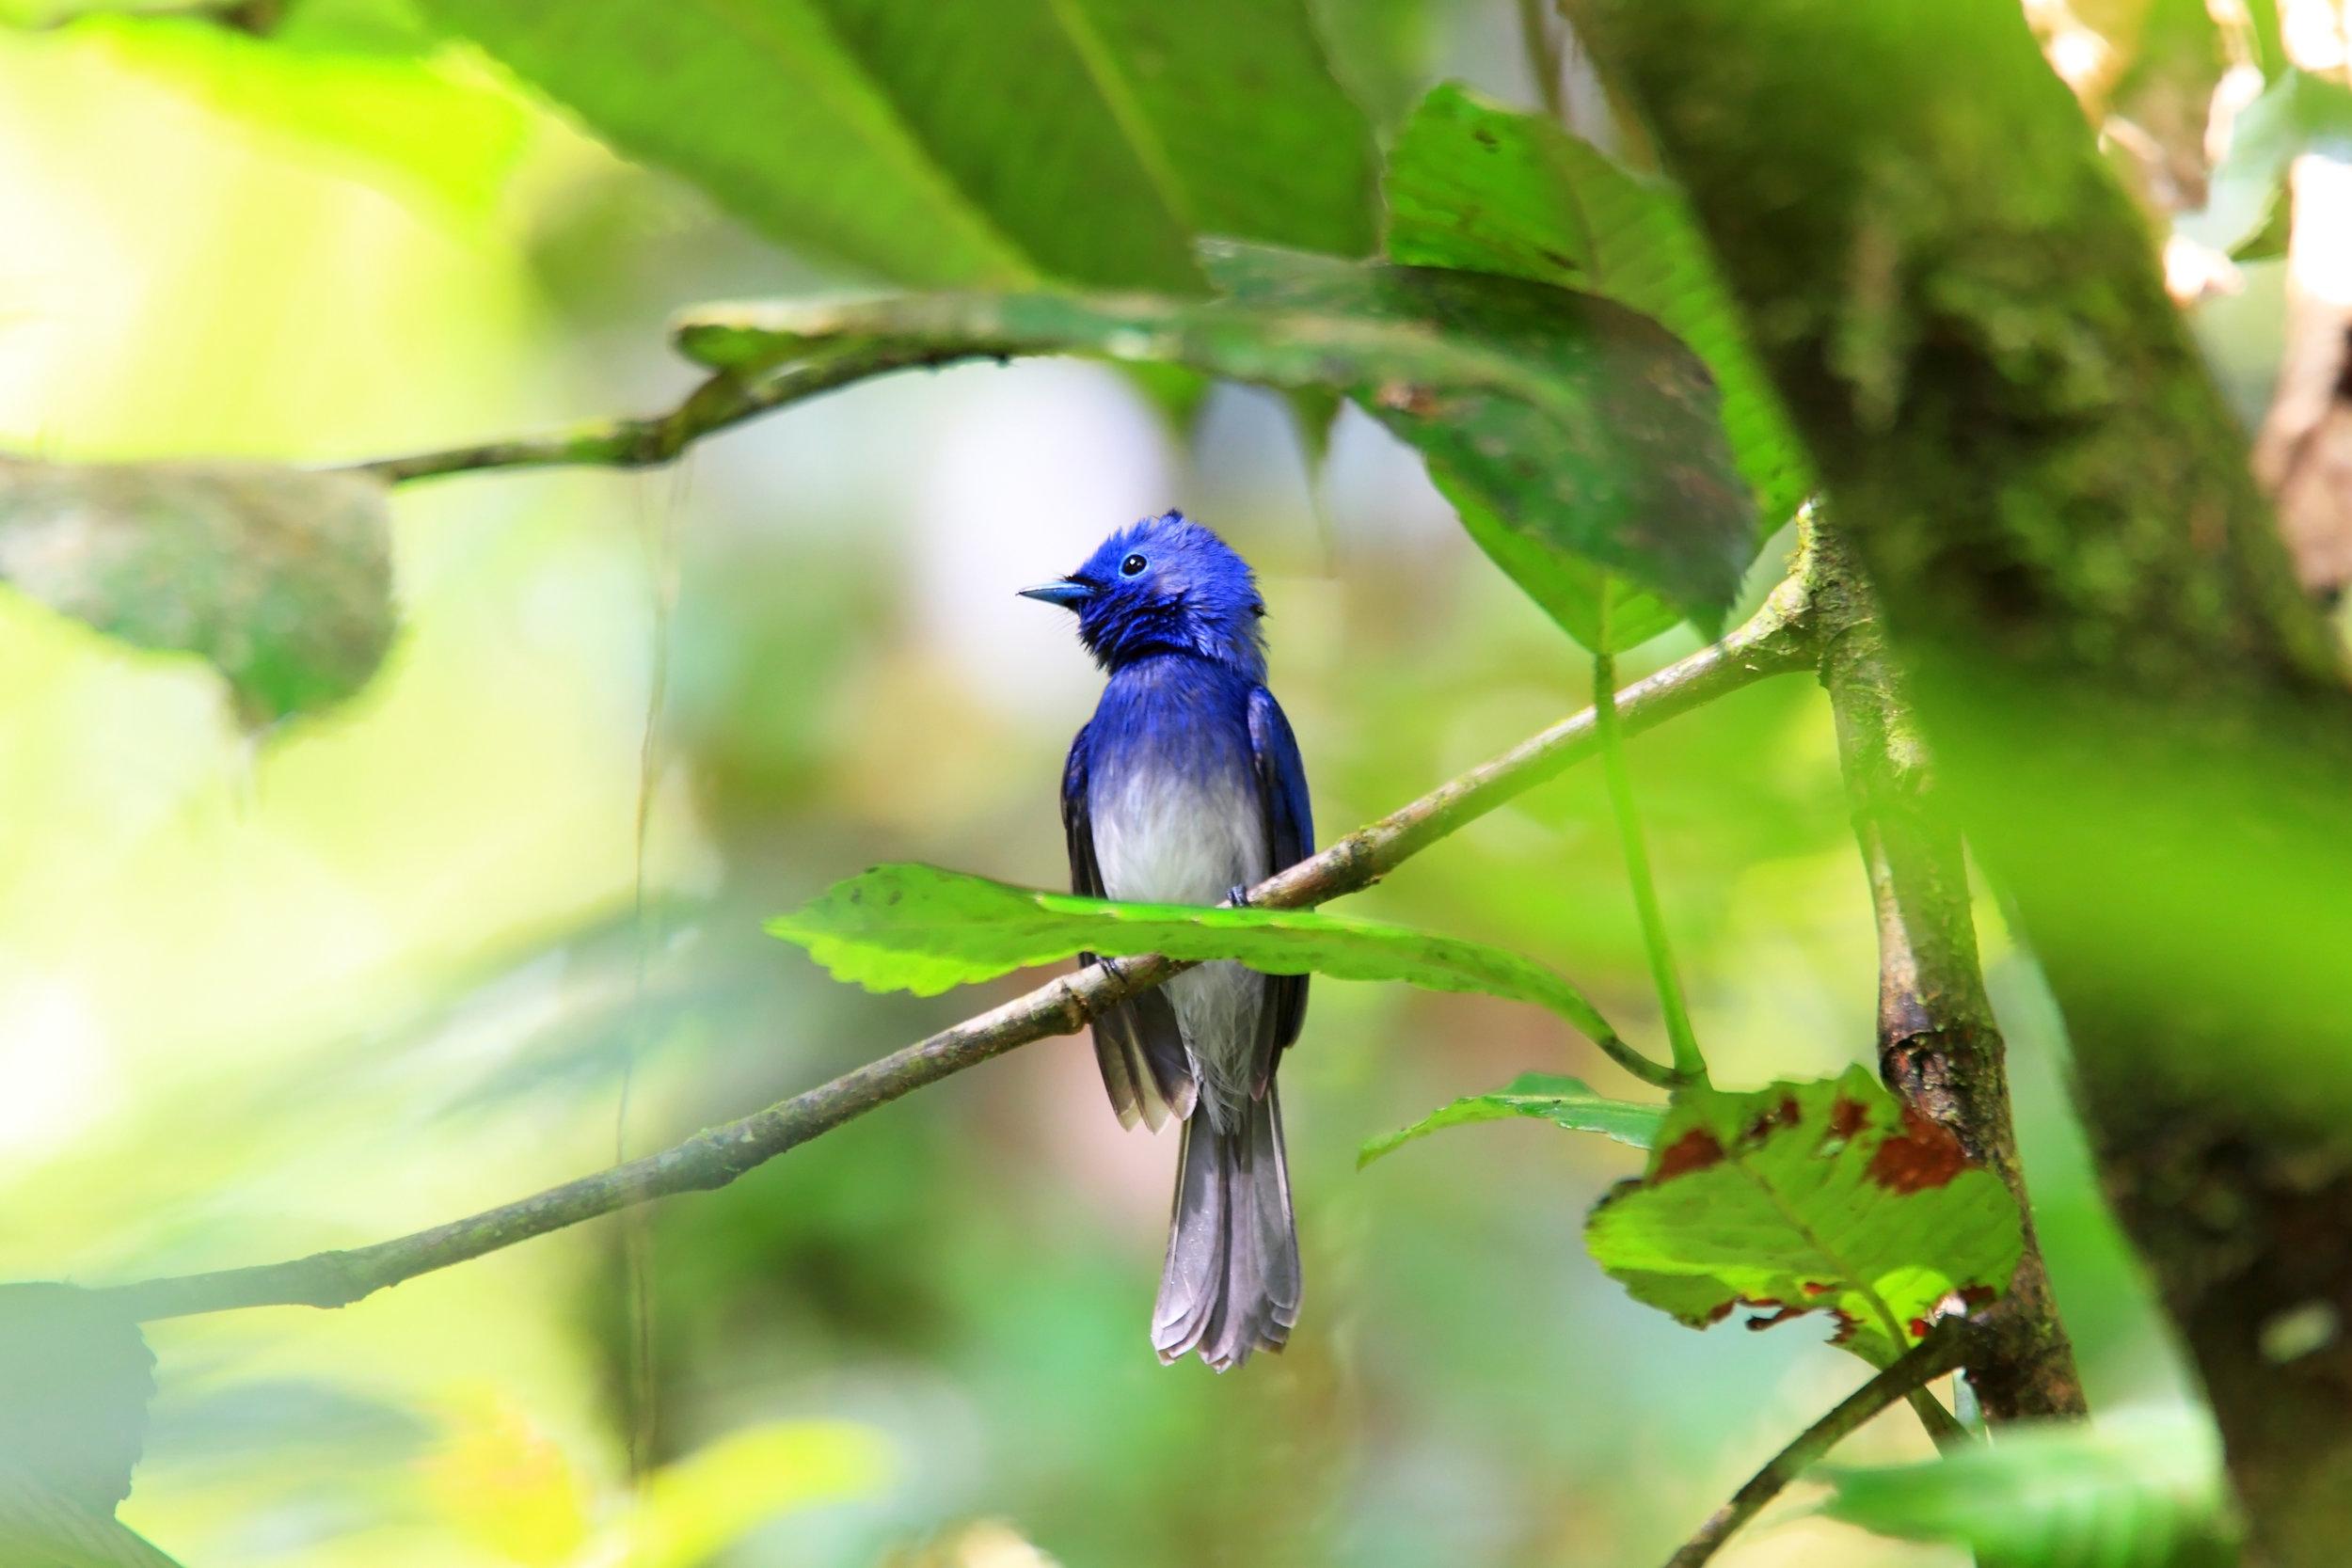 invite-to-paradise-sri-lanka-specialists-experts-travel-agent-tour-operator- 171242555 - Black-naped Monarch (Hypothymis azurea) male in Sri lanka.jpg